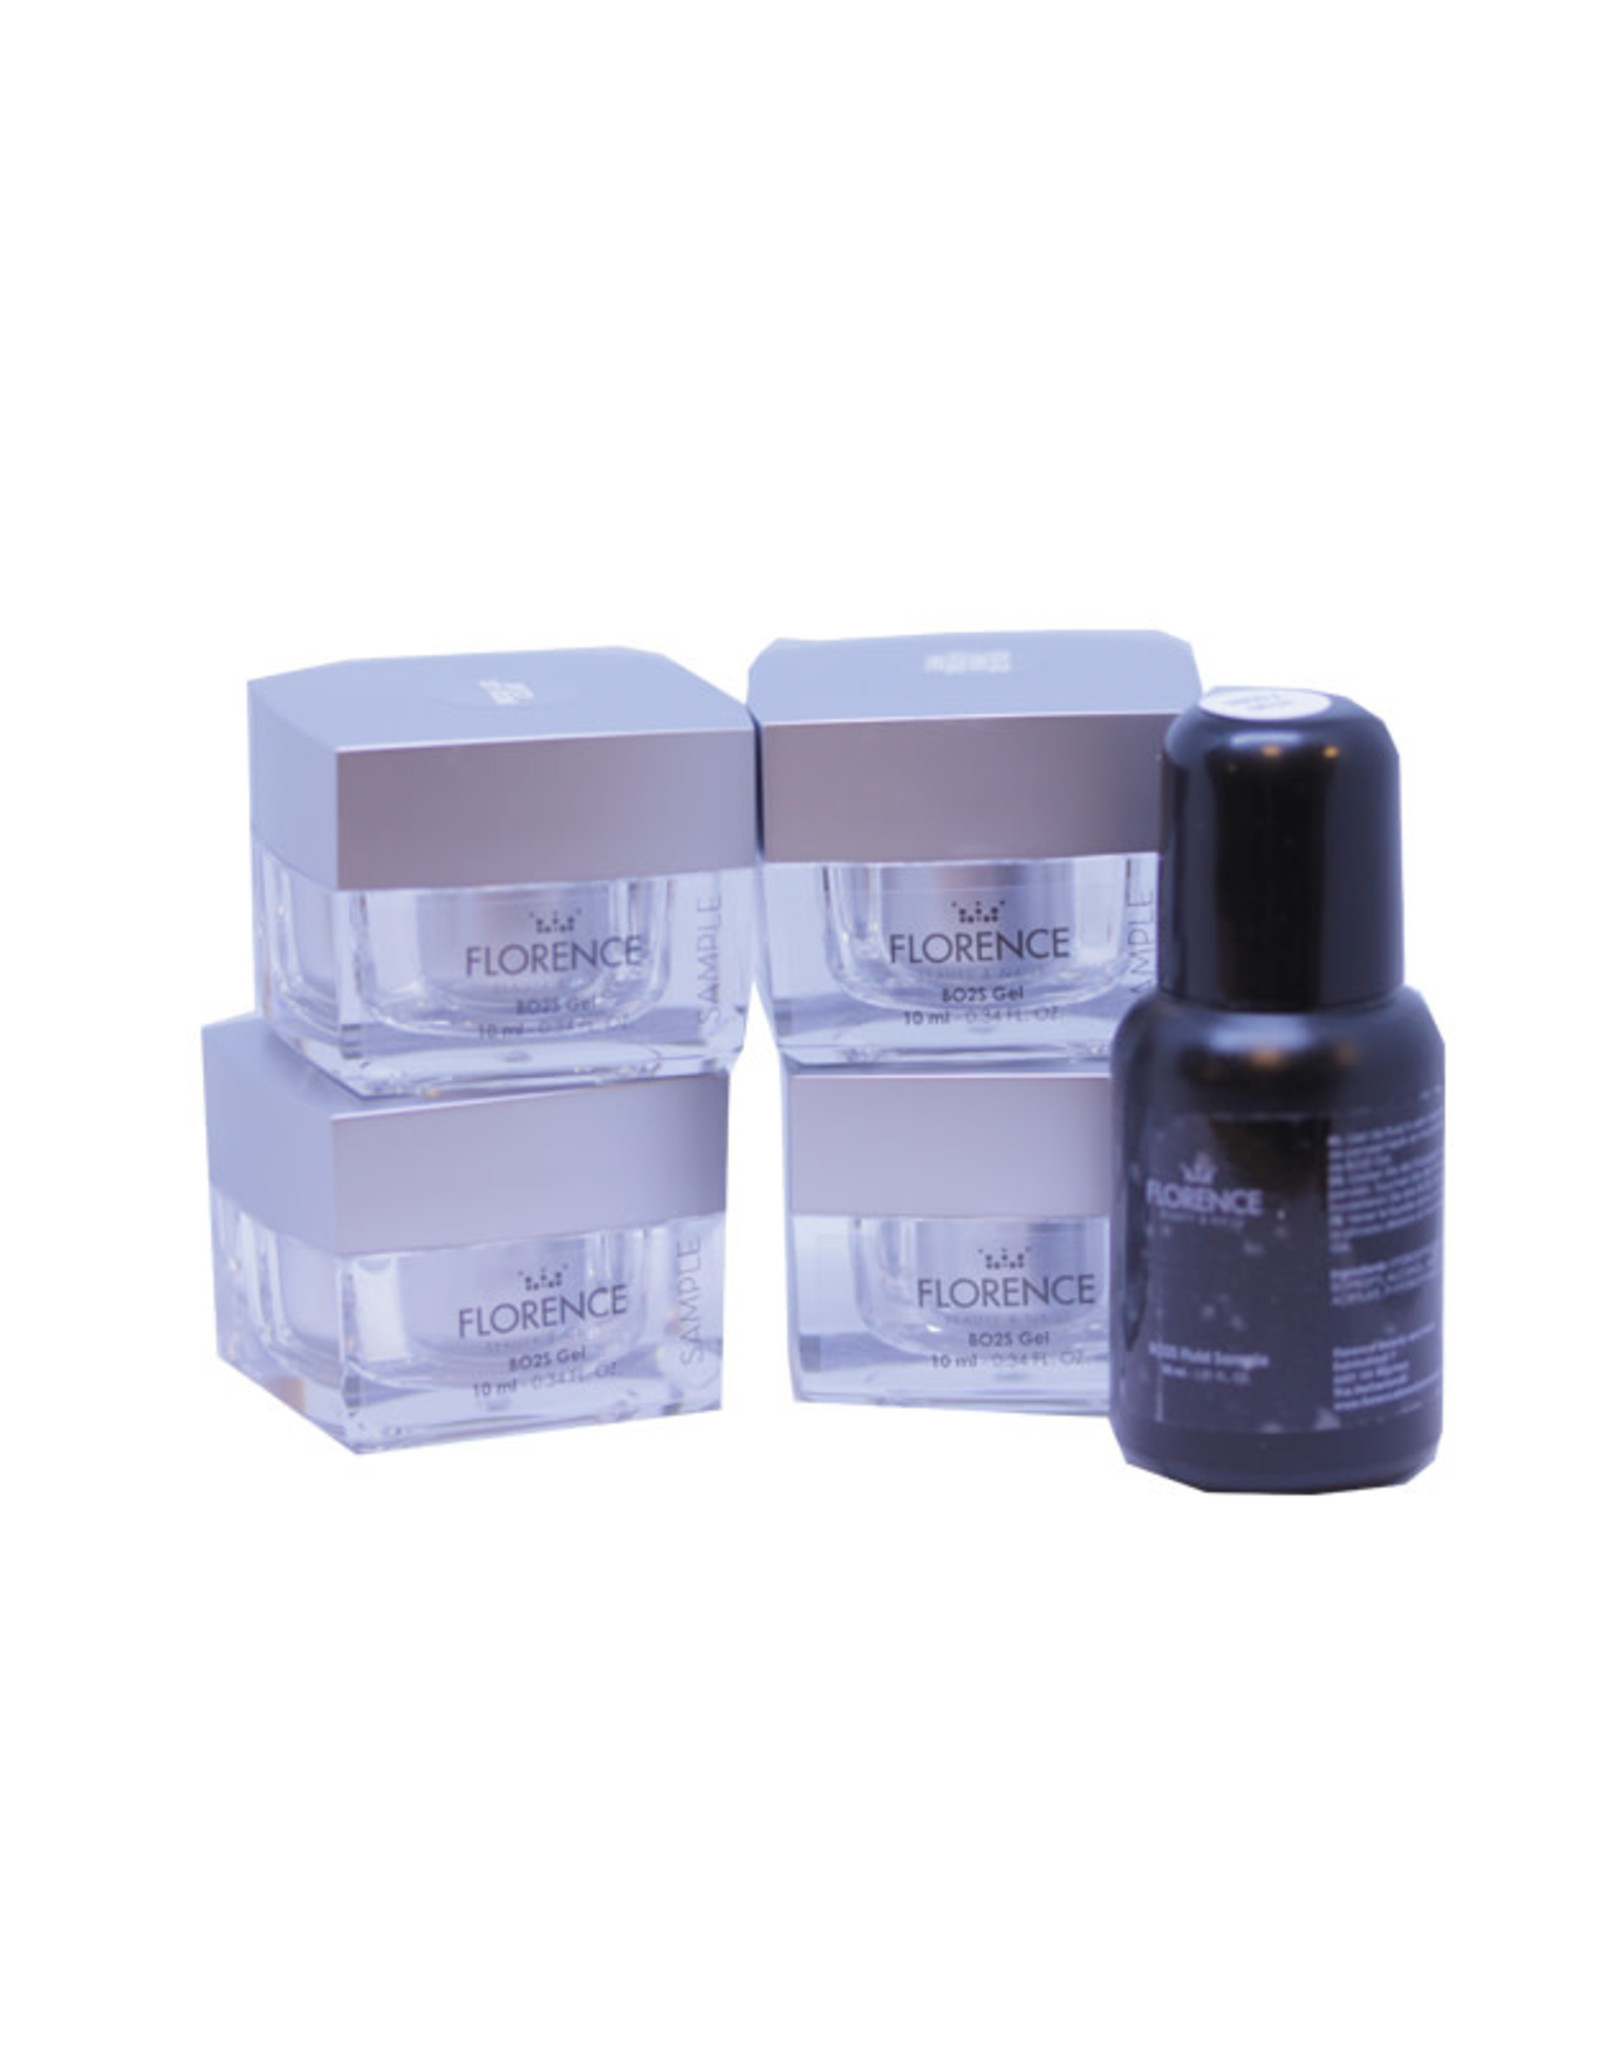 Florence Nails BO2S Gel Sample Kit (met French White)